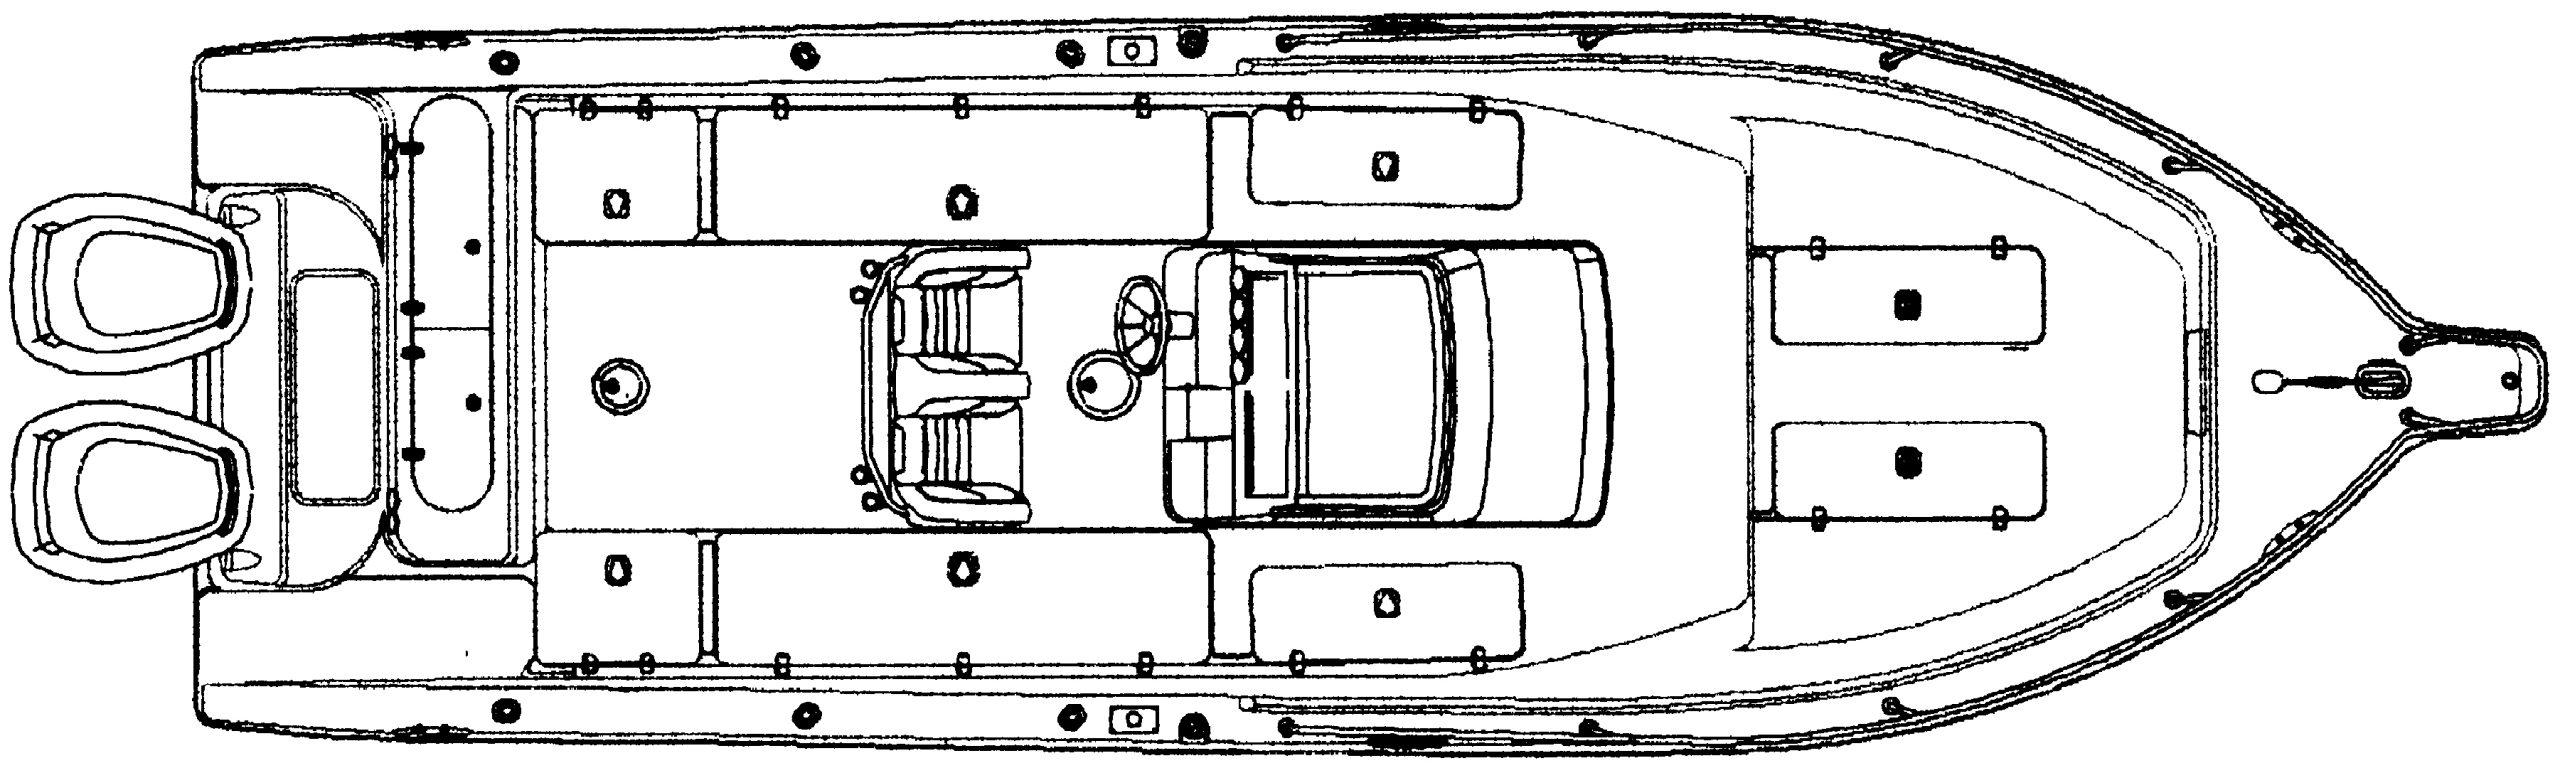 2900-2901 Center Console Floor Plan 2